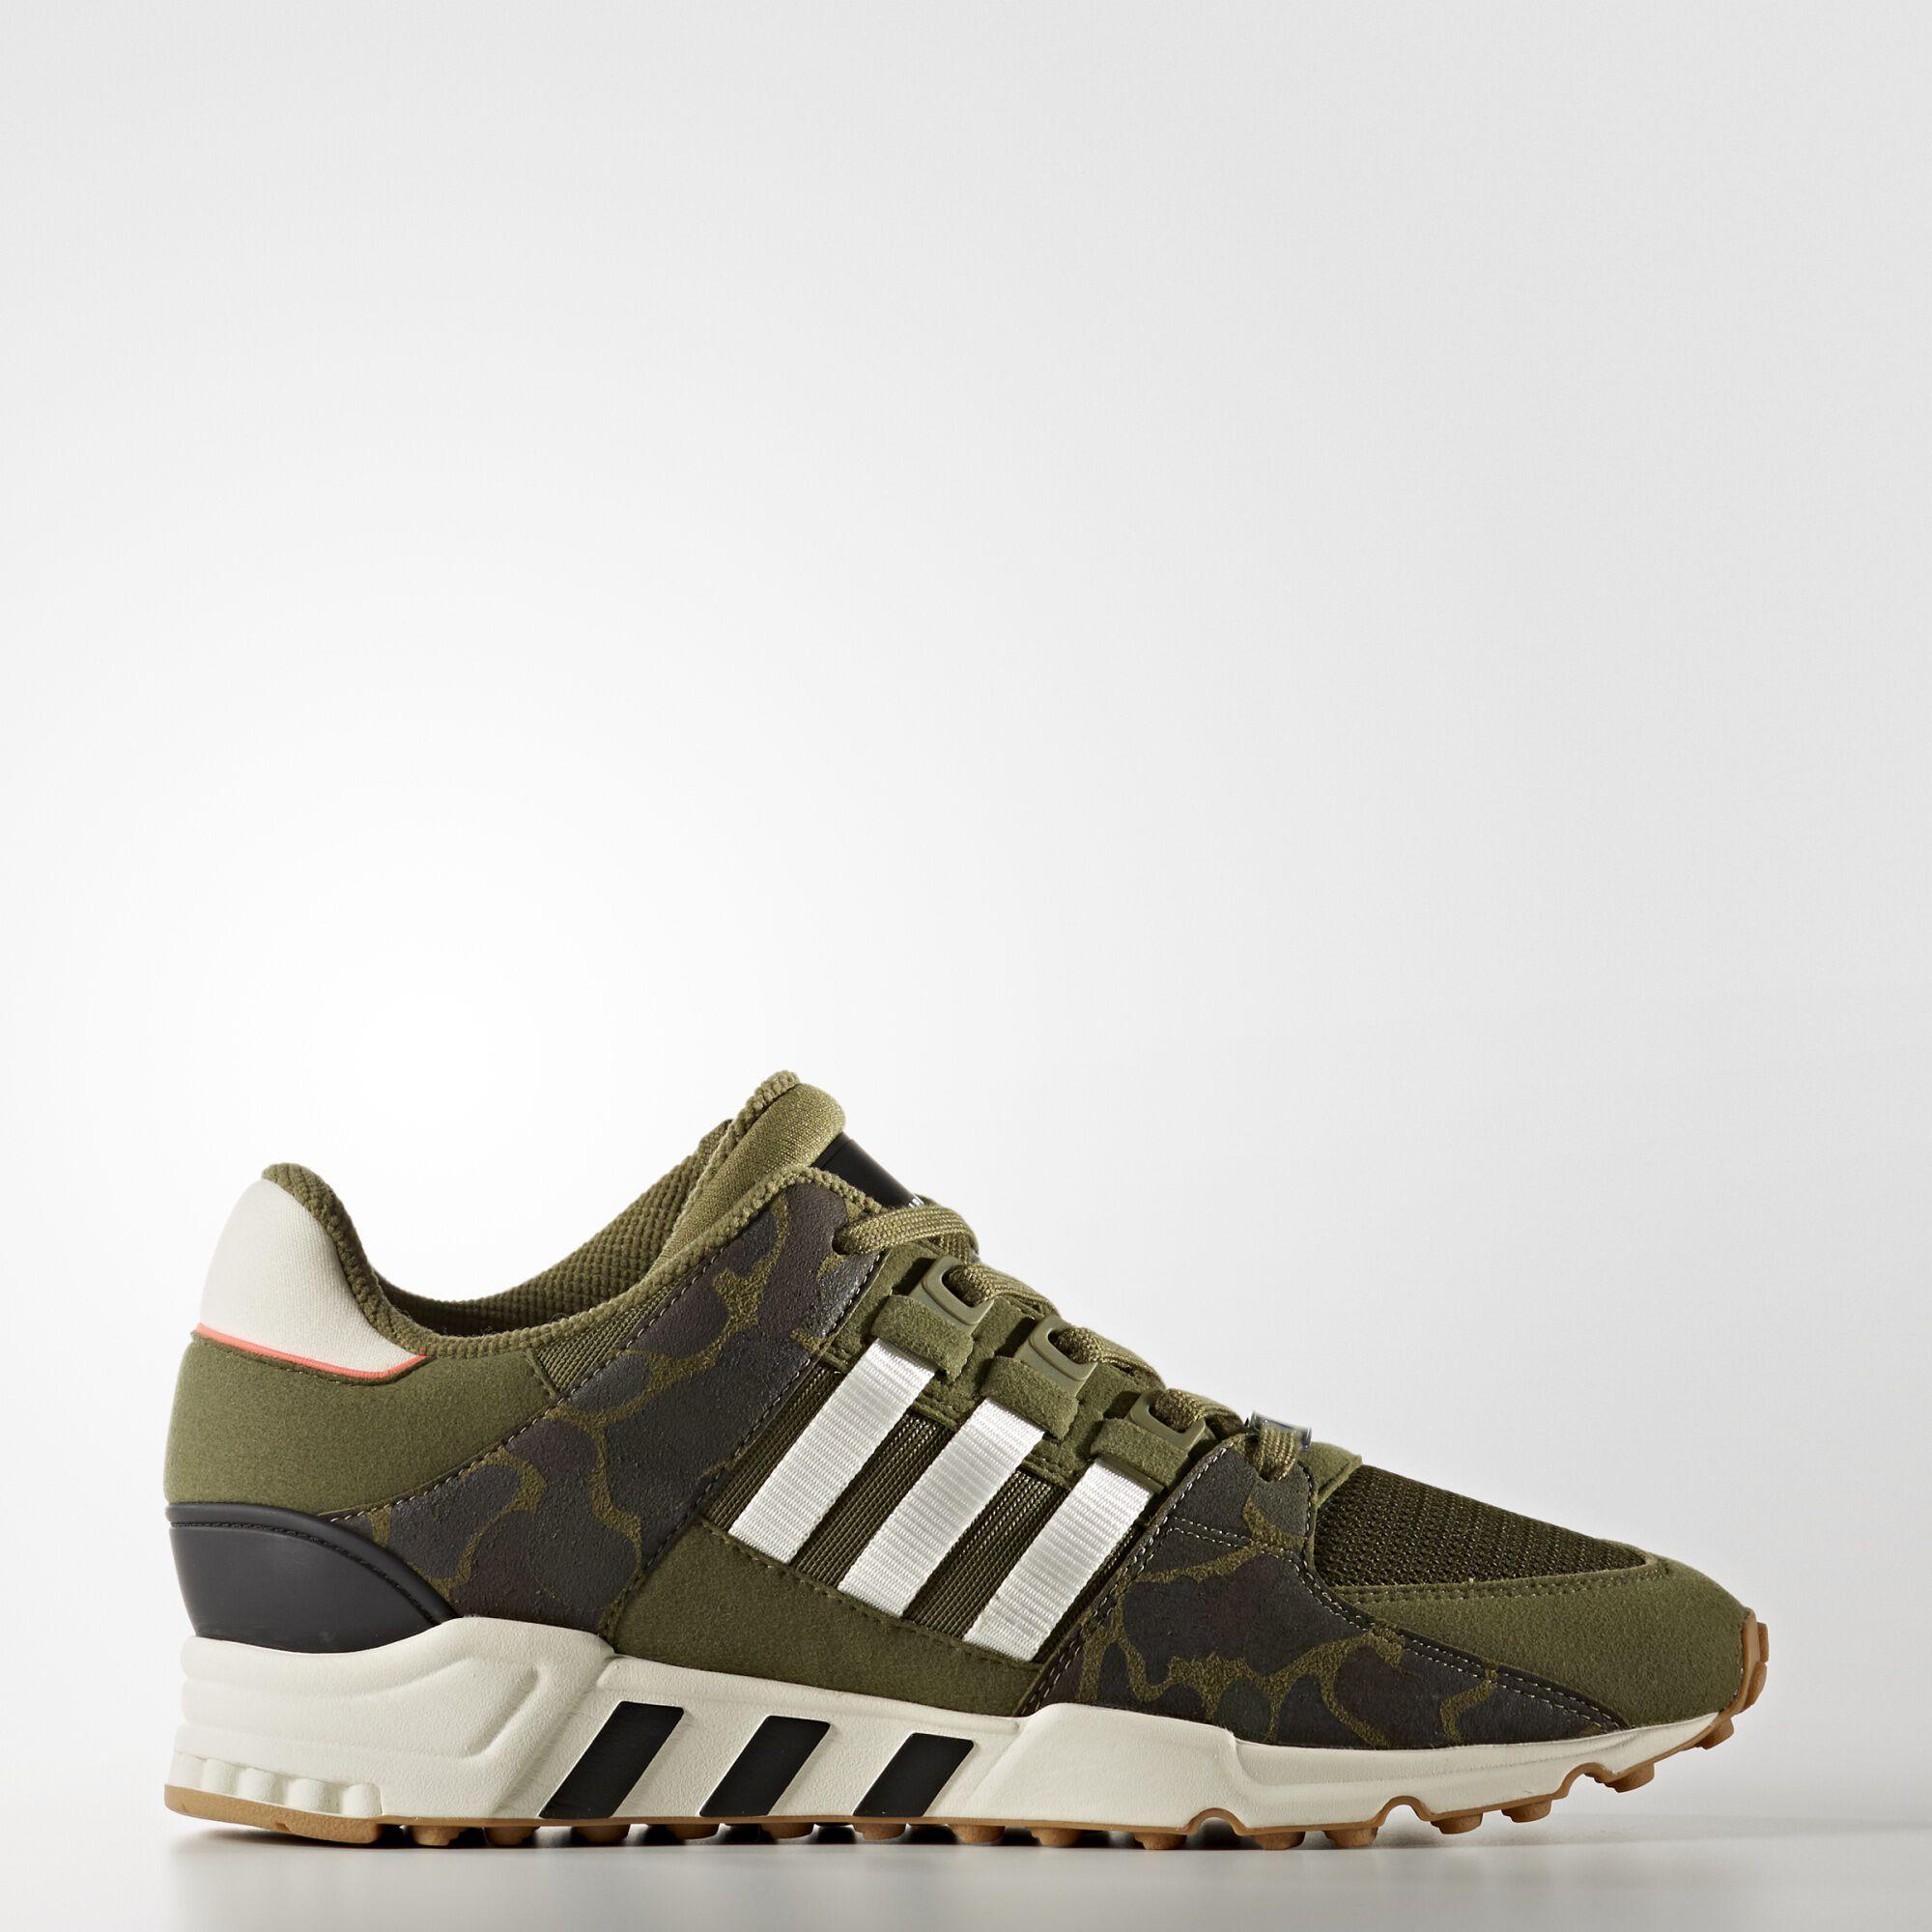 Adidas Eqt Olive Cargo